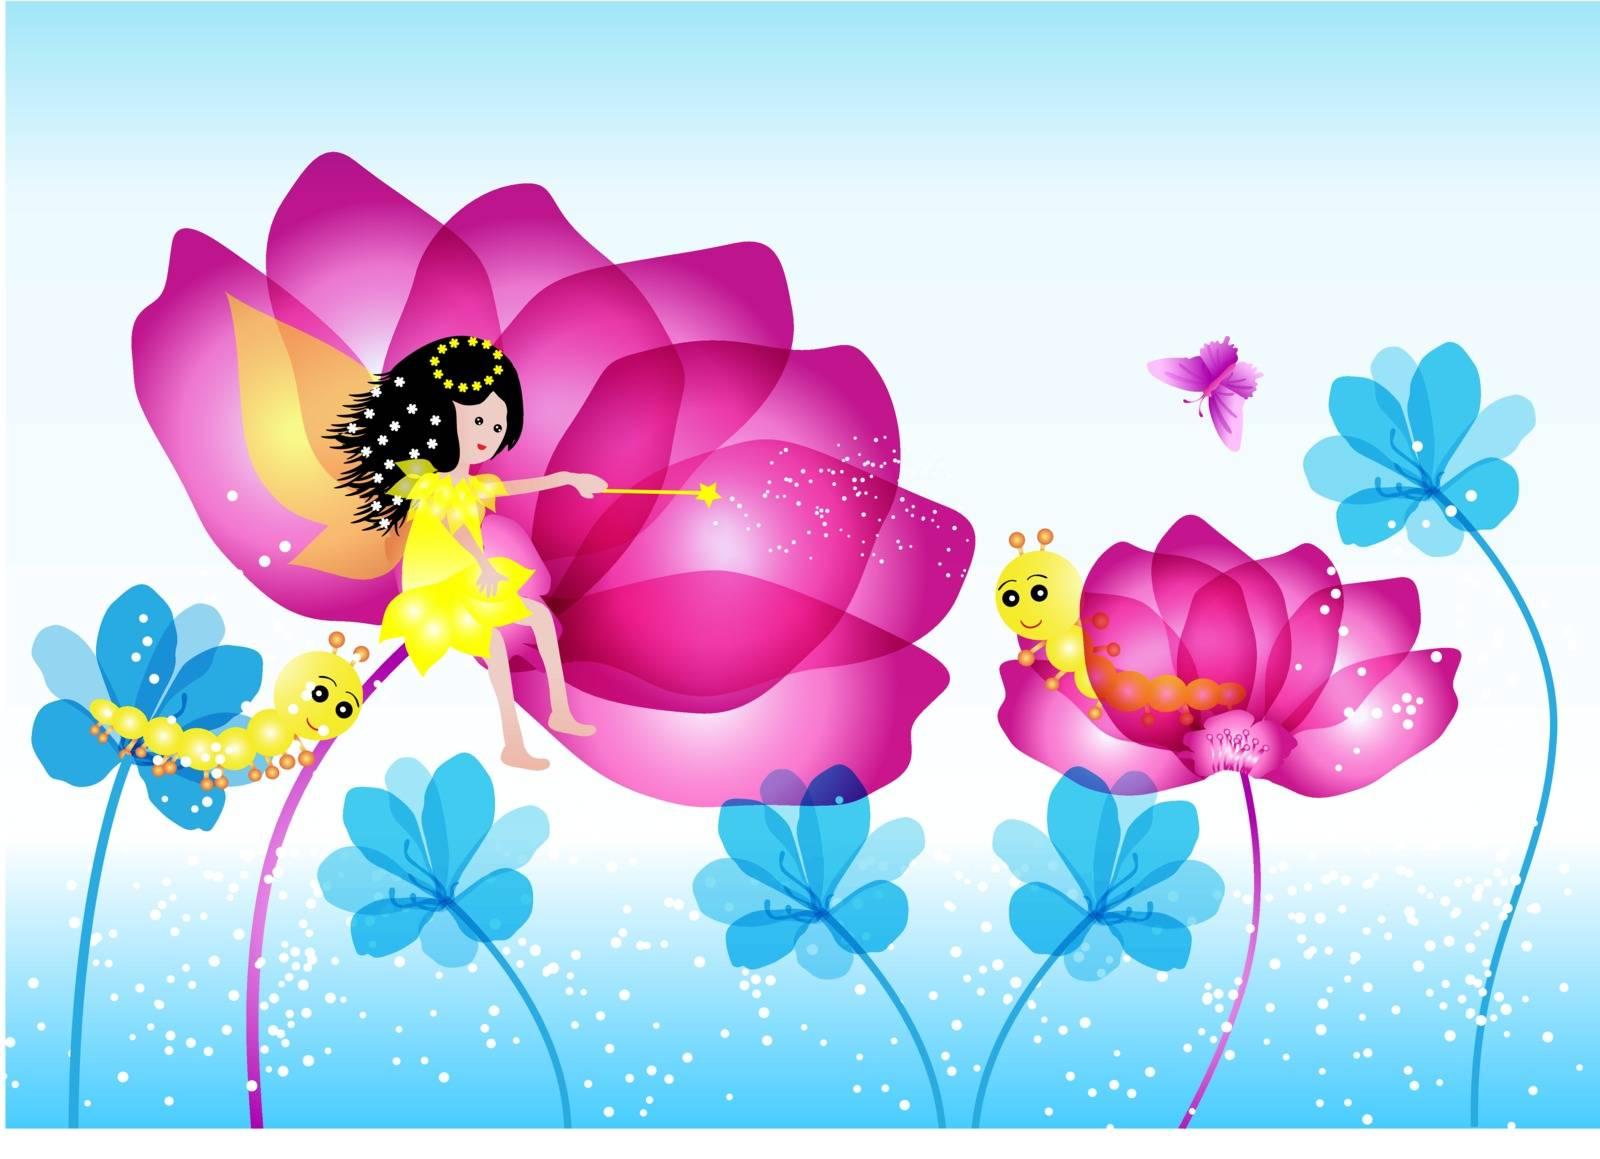 Cute little fairy sitting on a flowers